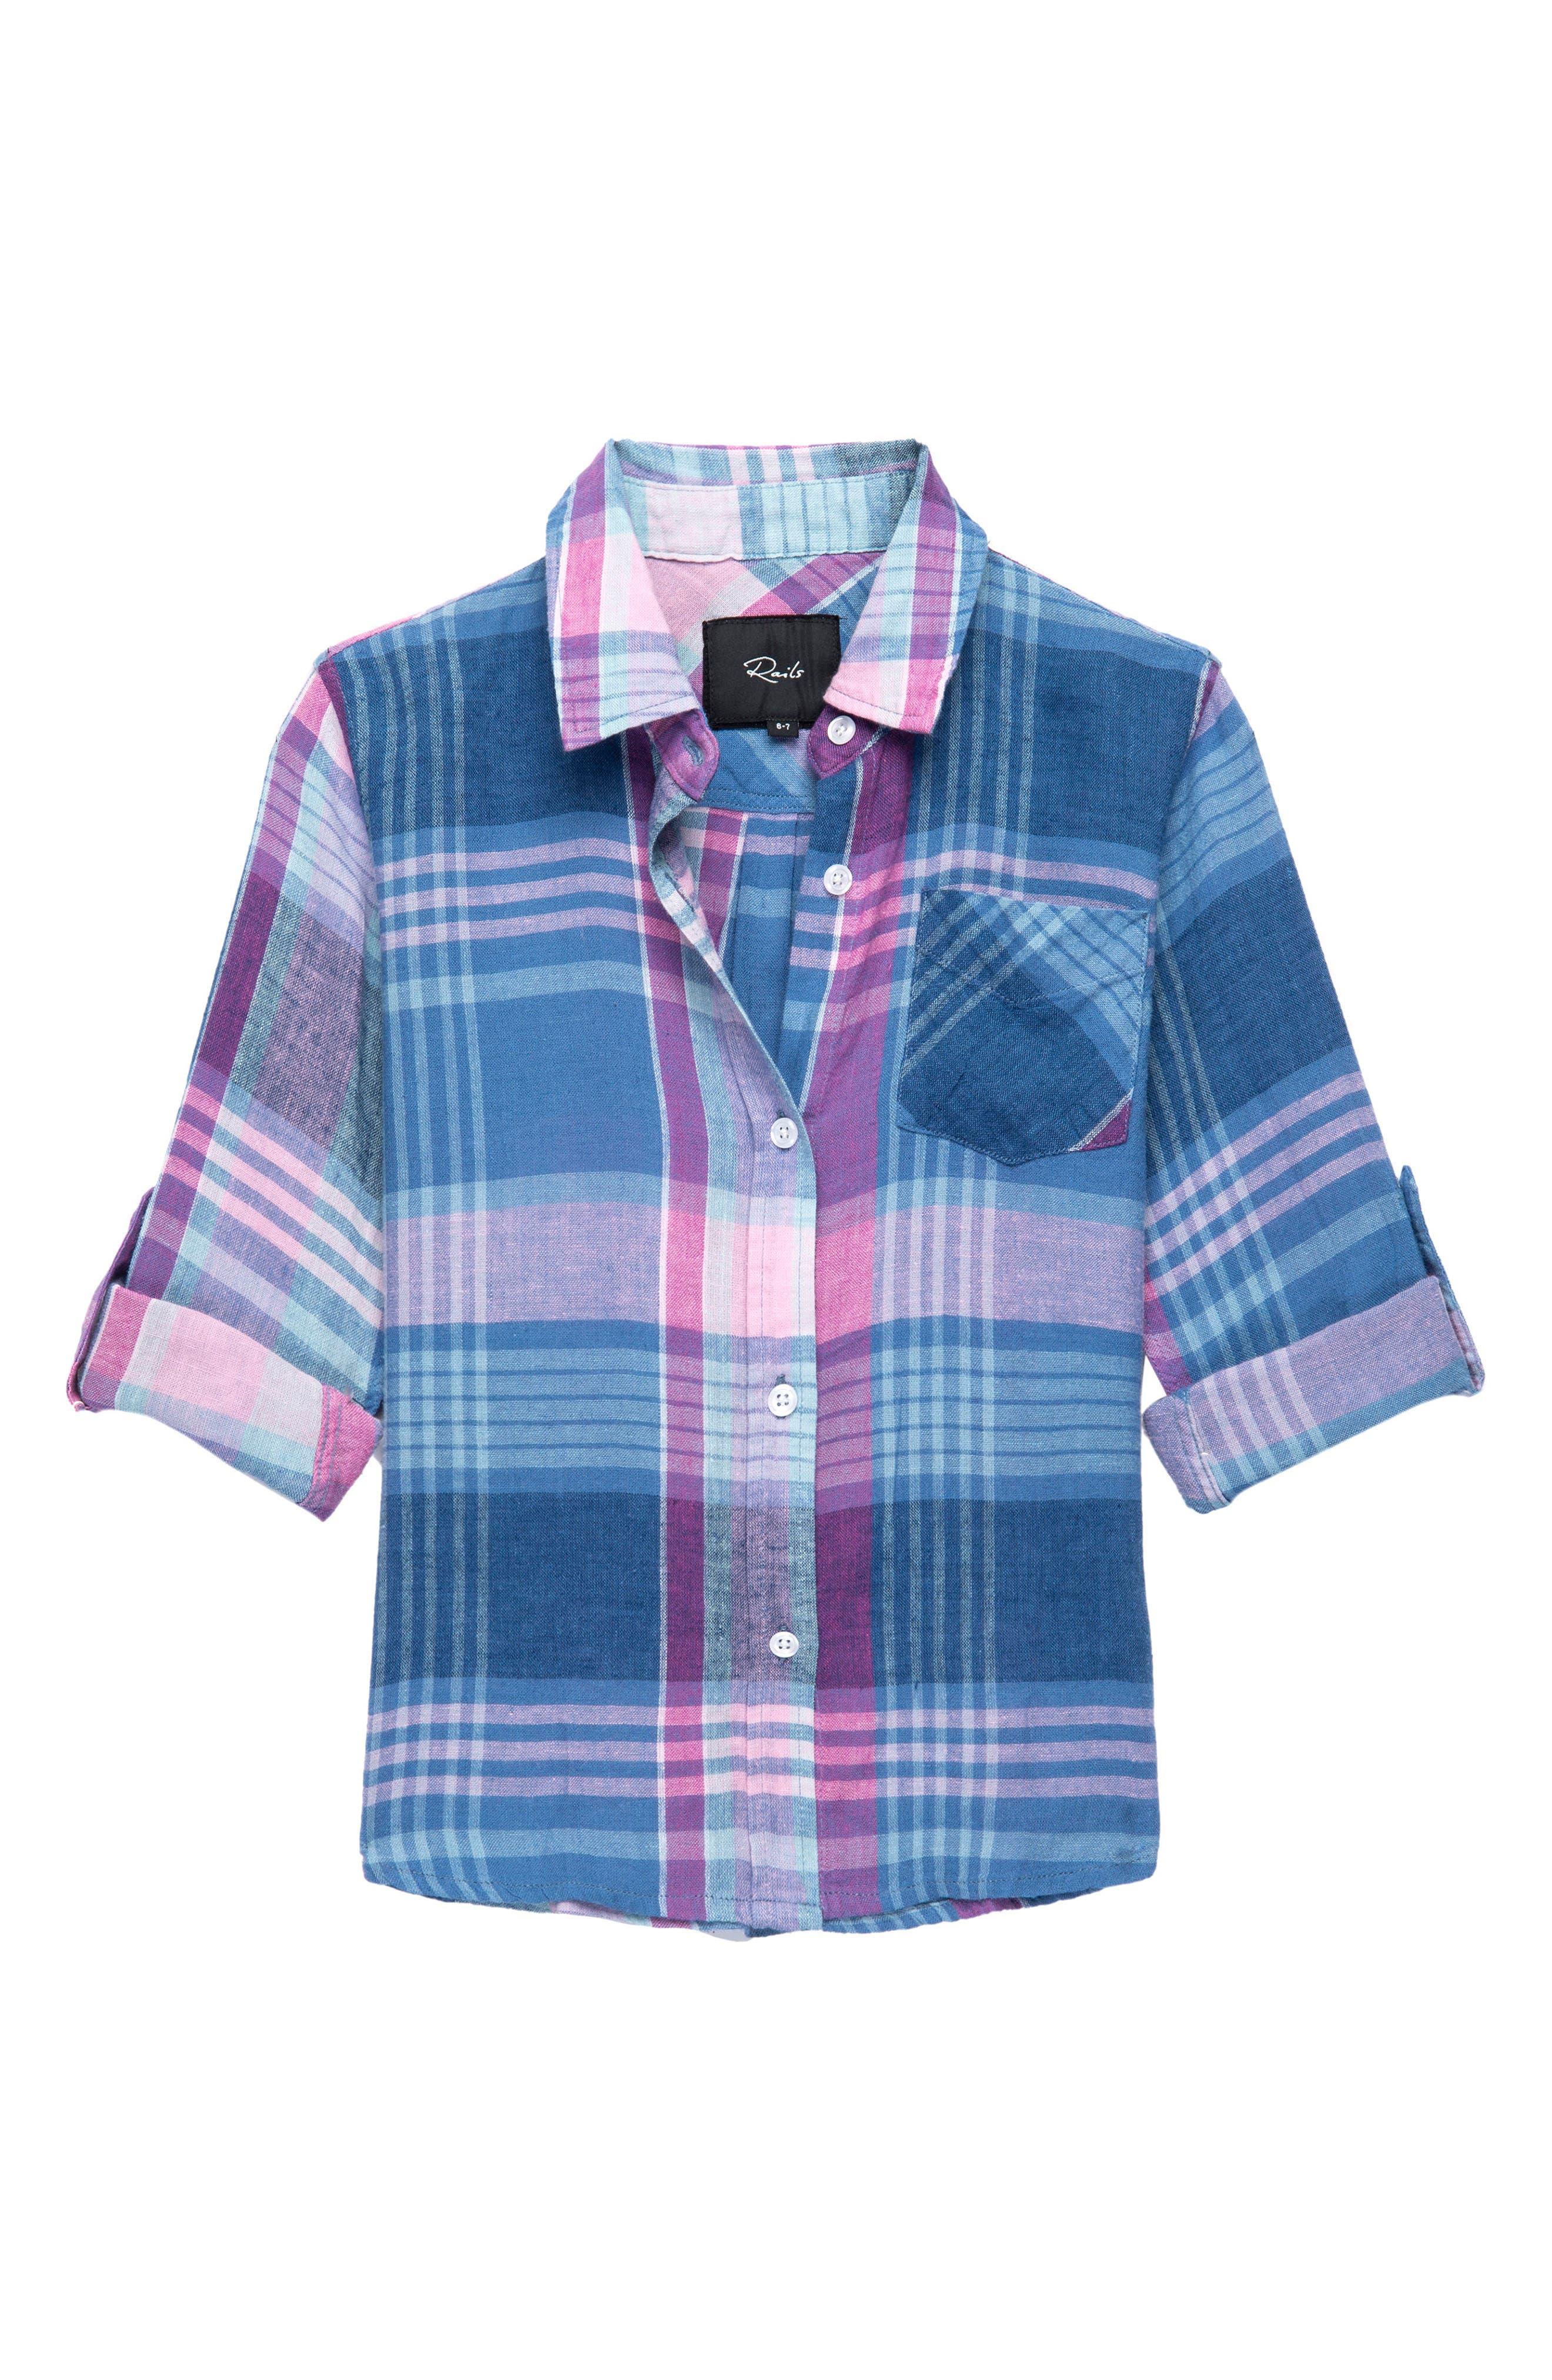 Main Image - Rails Cora Plaid Shirt (Big Girls)